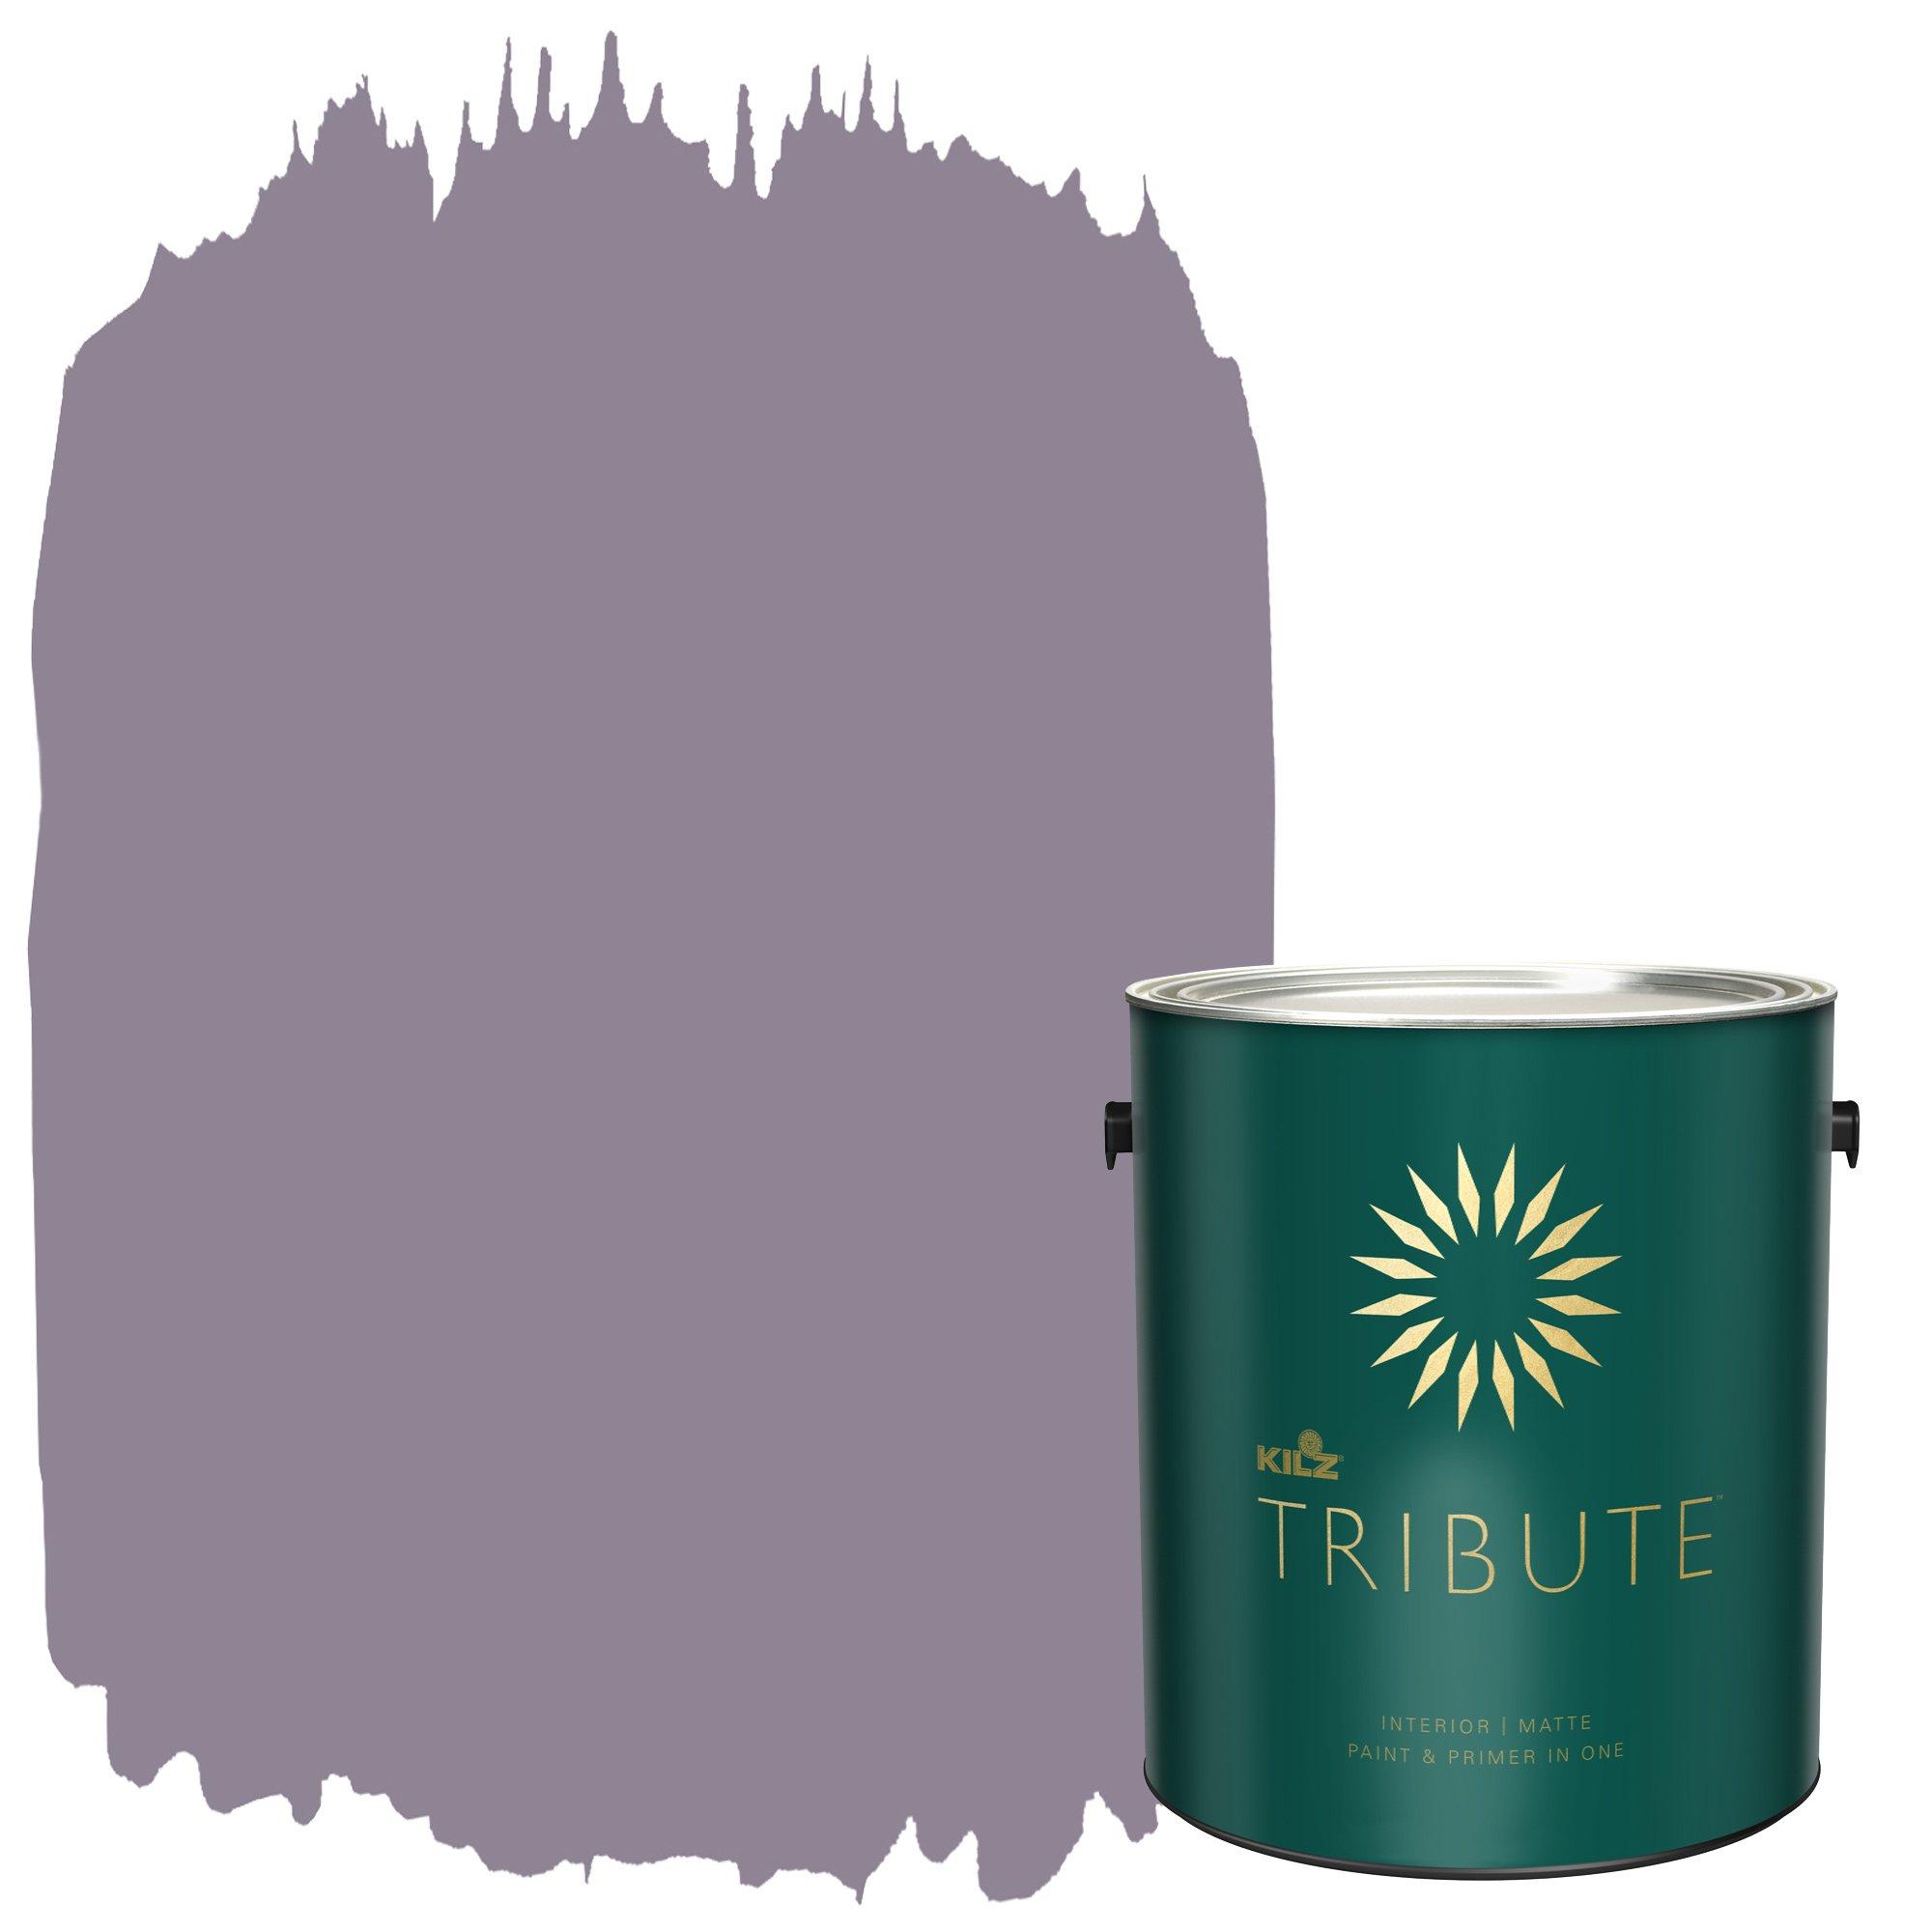 KILZ TRIBUTE Interior Matte Paint and Primer in One, 1 Gallon, Orchid Smoke (TB-27)